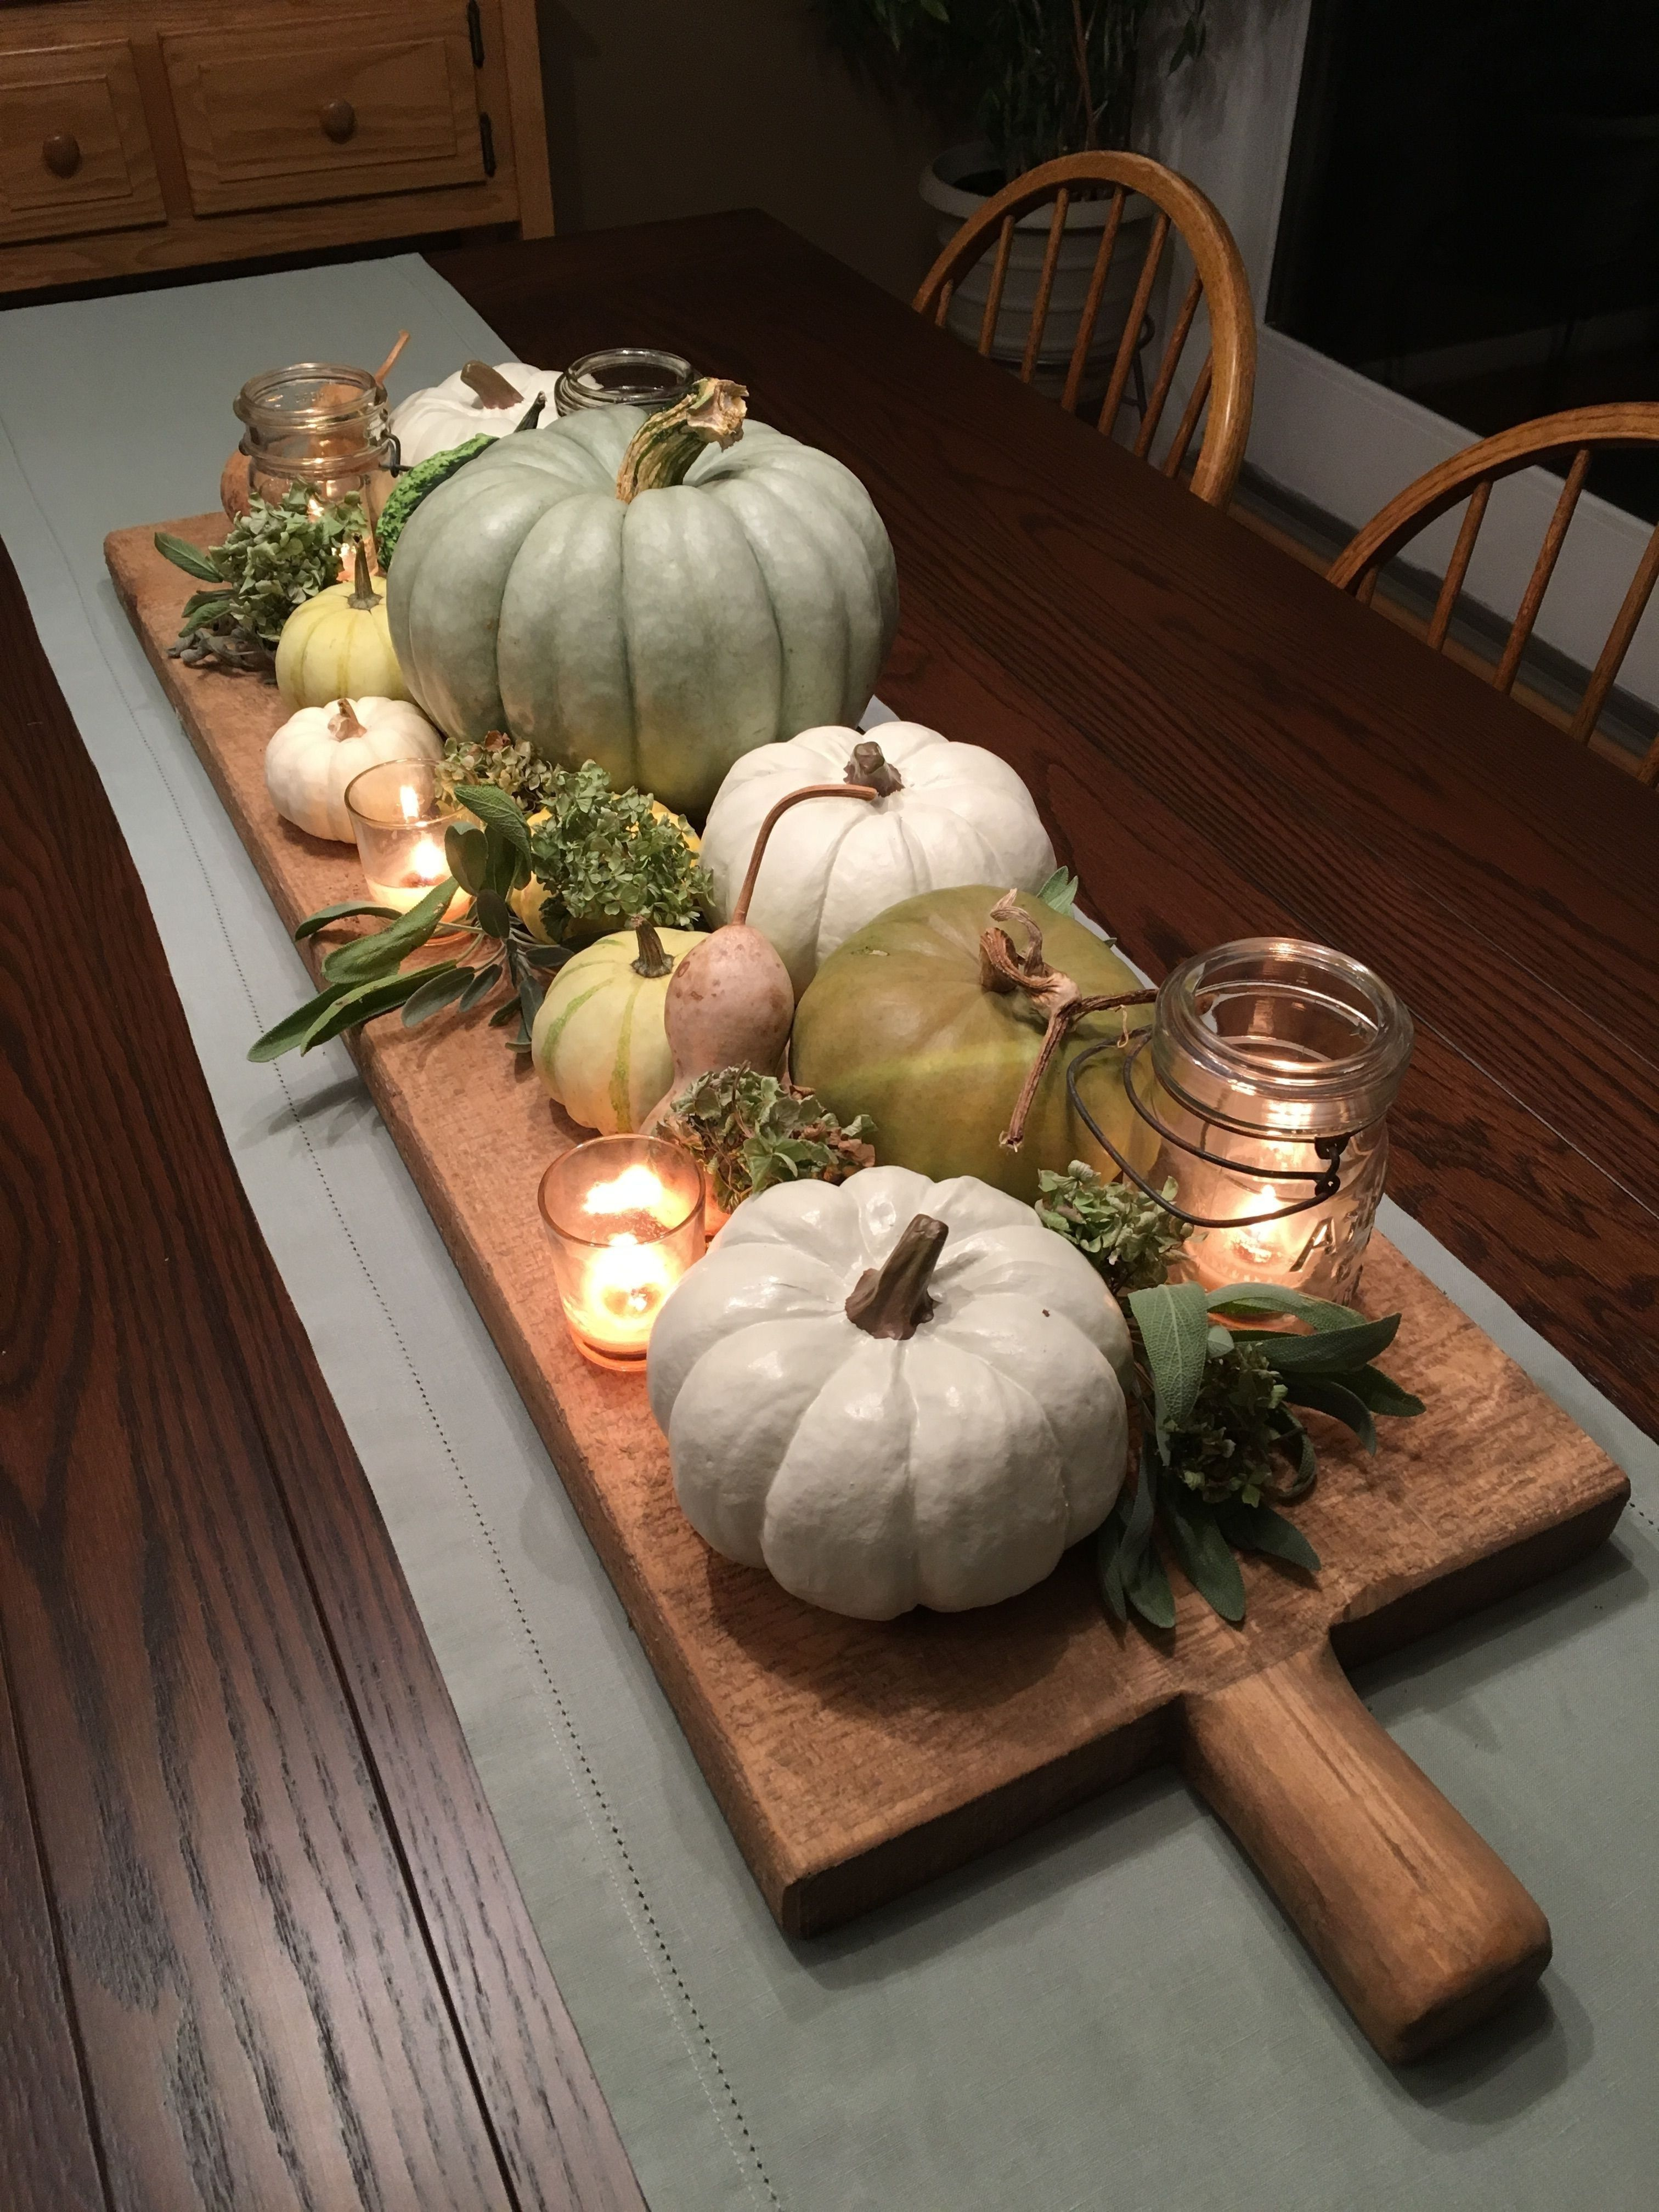 Most Amazing Farmhouse Table Centrepiece Design Ideas 02 #herfstdecoraties